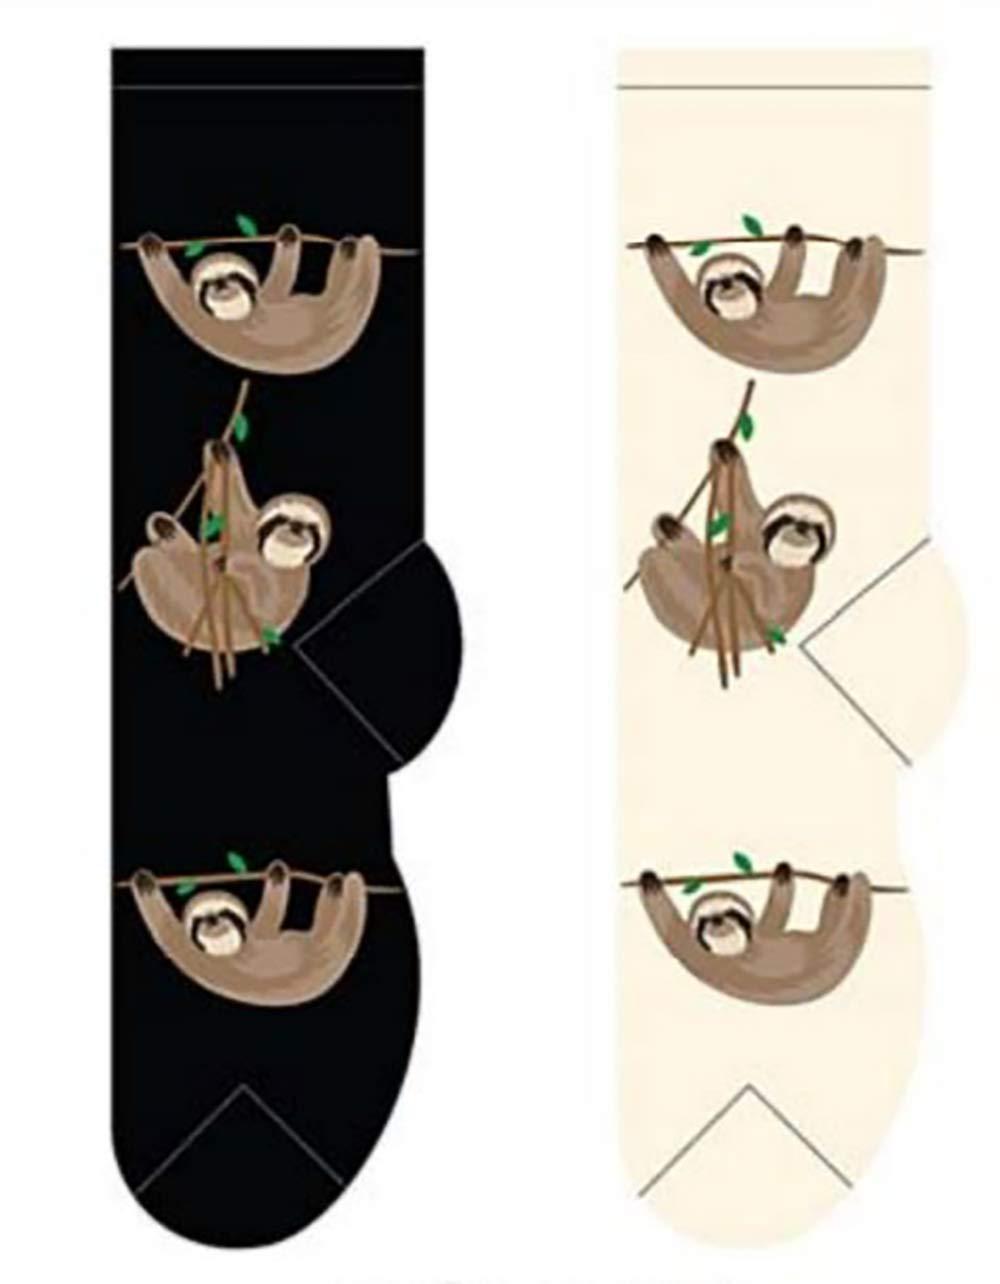 Foozys Women's Crew Socks | Cute Zoo Animal Themed Novelty Socks | 2 Pairs -